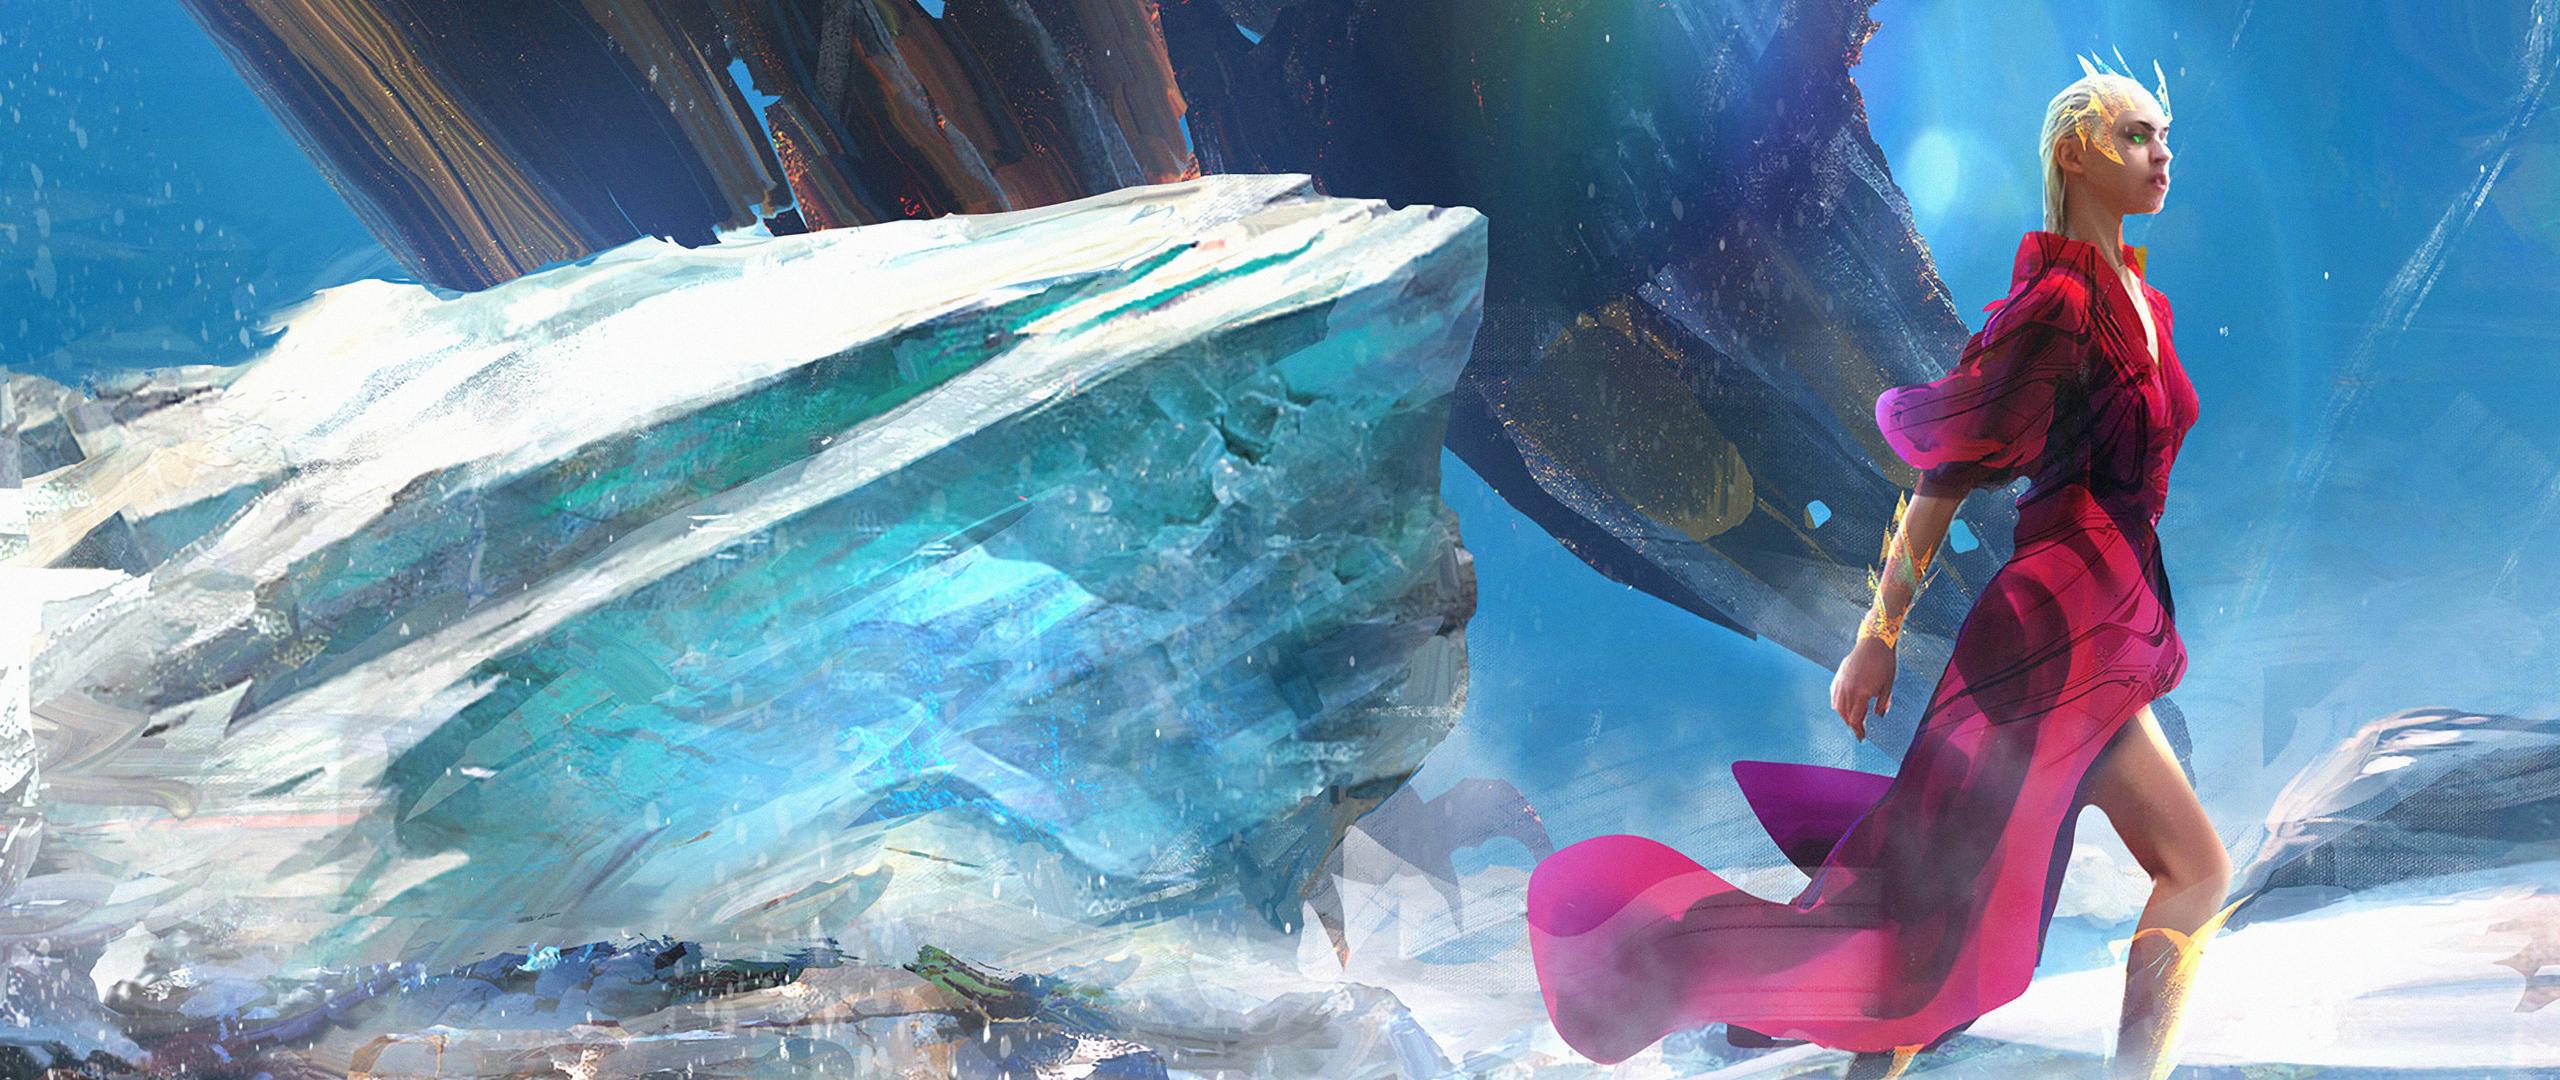 glacial-dragon-queen-4k-6h.jpg